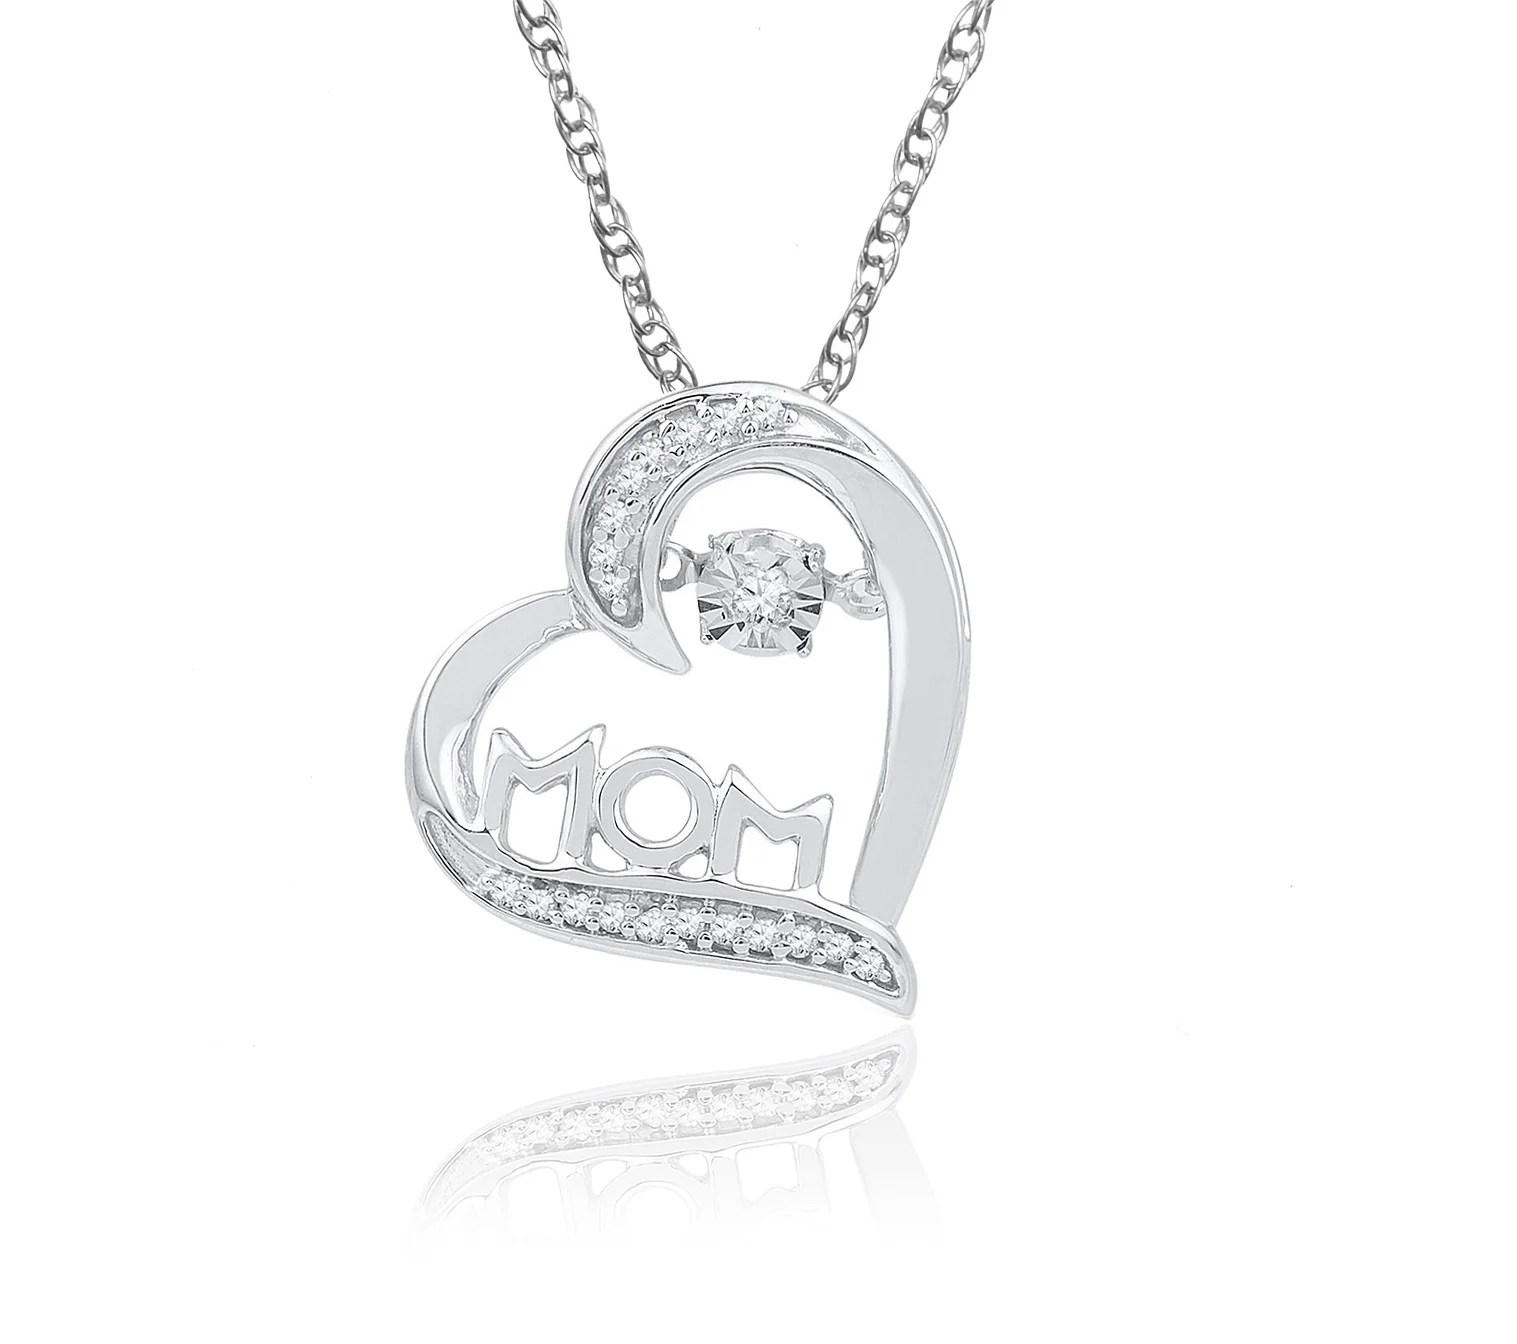 Pleasing G Diamond Heart Mom Necklace G Womens Round Diamond Mom Mor Heart Love Pendant Diamond Heart Necklace G Diamond Heart Necklace Yellow G wedding diamonds Diamond Heart Necklace